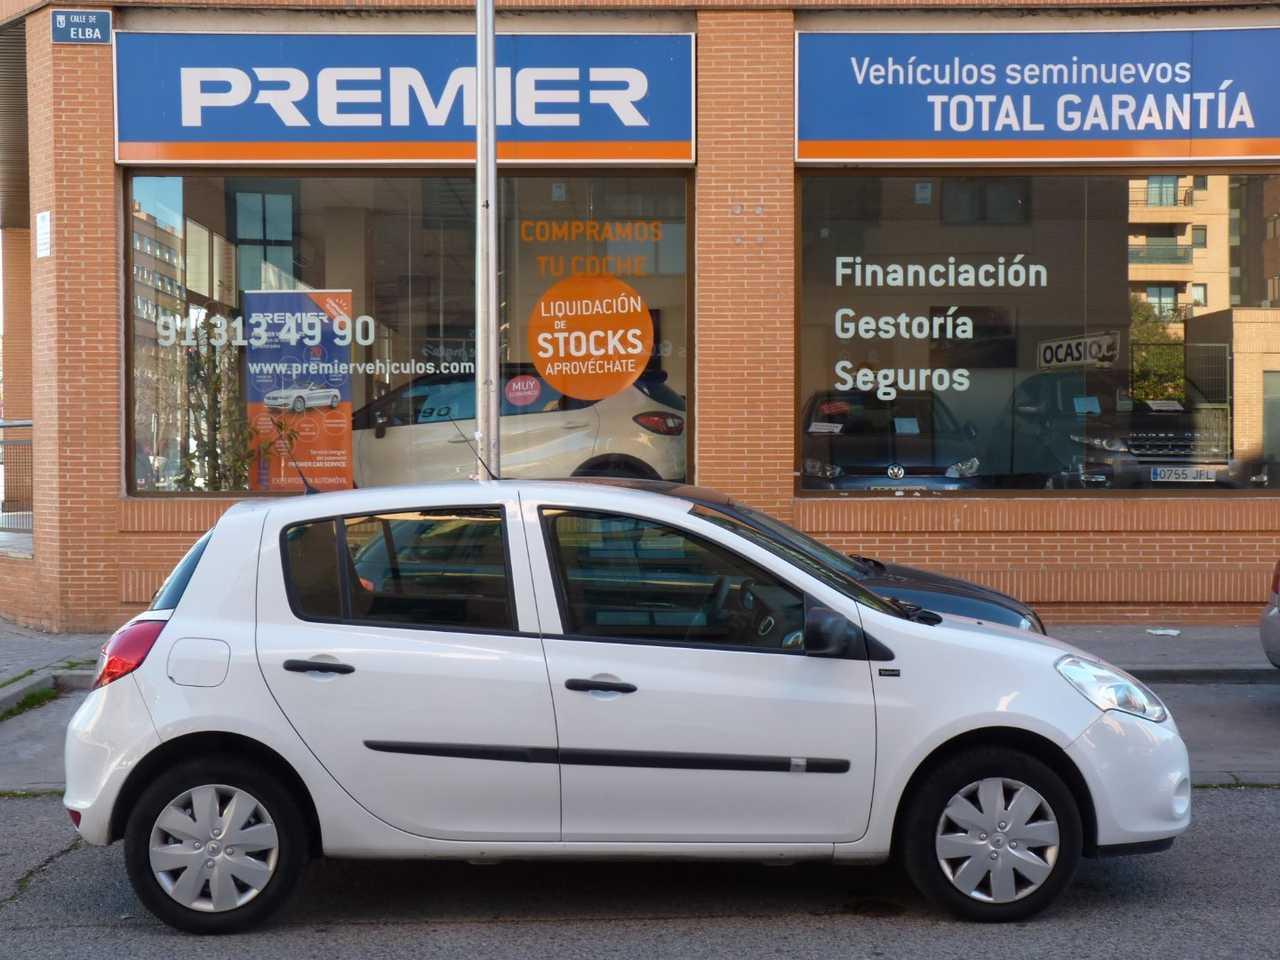 Renault Clio  Yahoo dCi 75  eco2 5p  - Foto 1